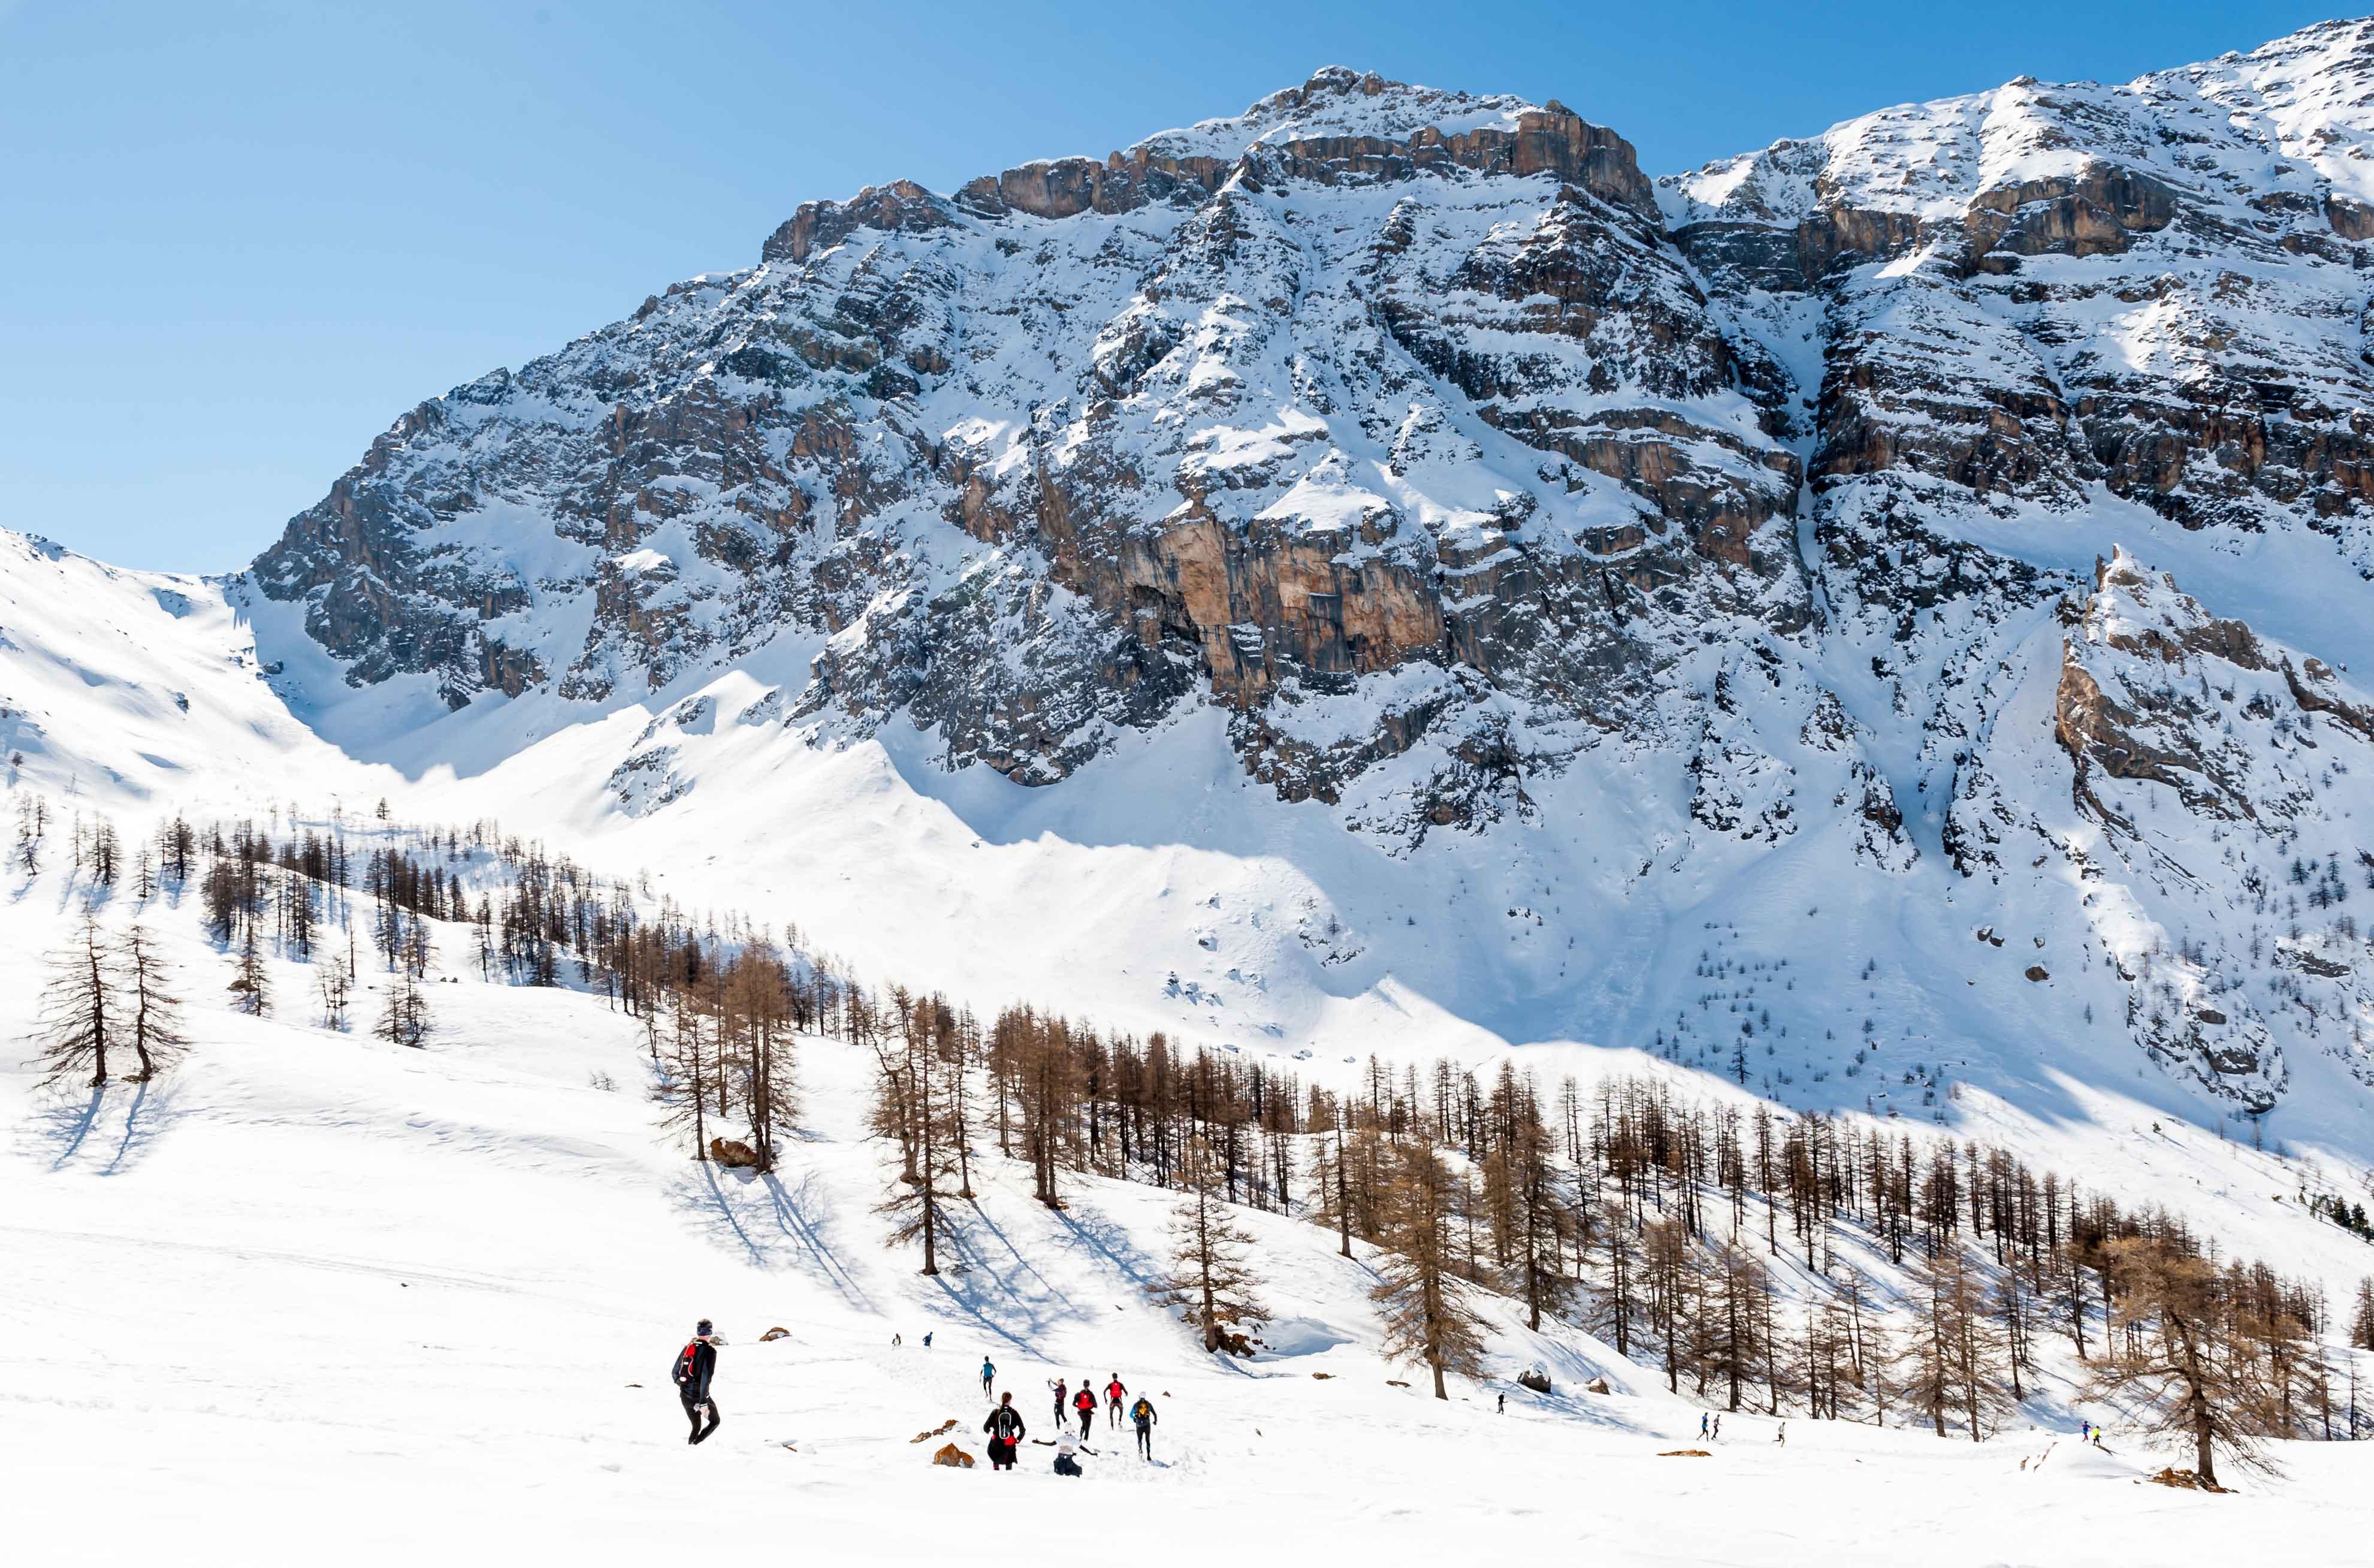 Ambiance 2017 Ubaye Trail Salomon photo Rémi Morel - UBAYE SNOW TRAIL SALOMON UNE 8EME EDITION FORT REUSSIE ! 19-02-2017 RESULTATS ET VIDEO